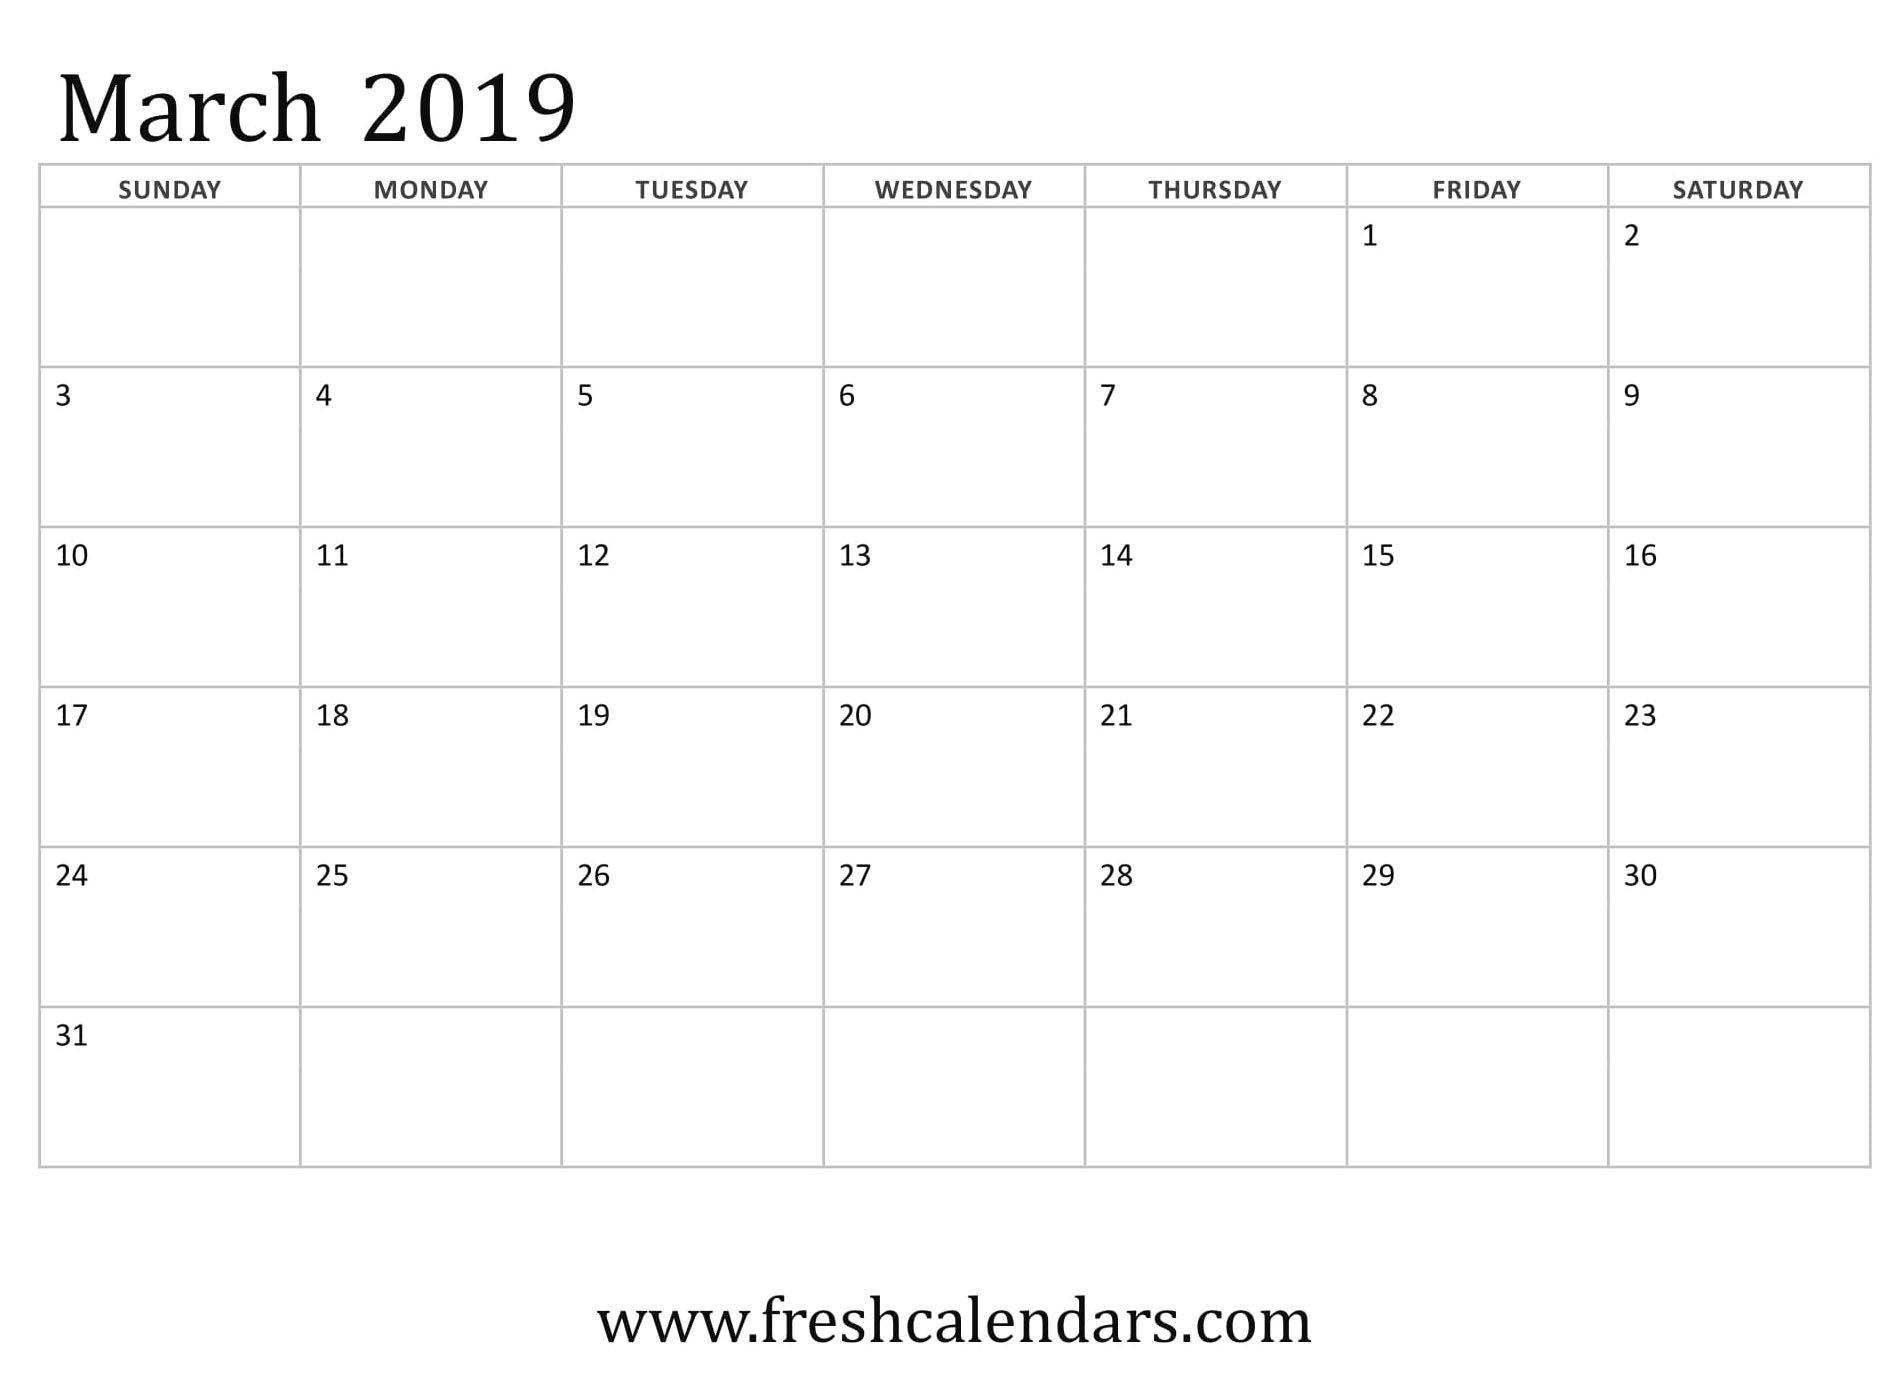 Vertex March Calendar 2019 Printable | Free March 2019 Calendar Calendar 2019 Vertex